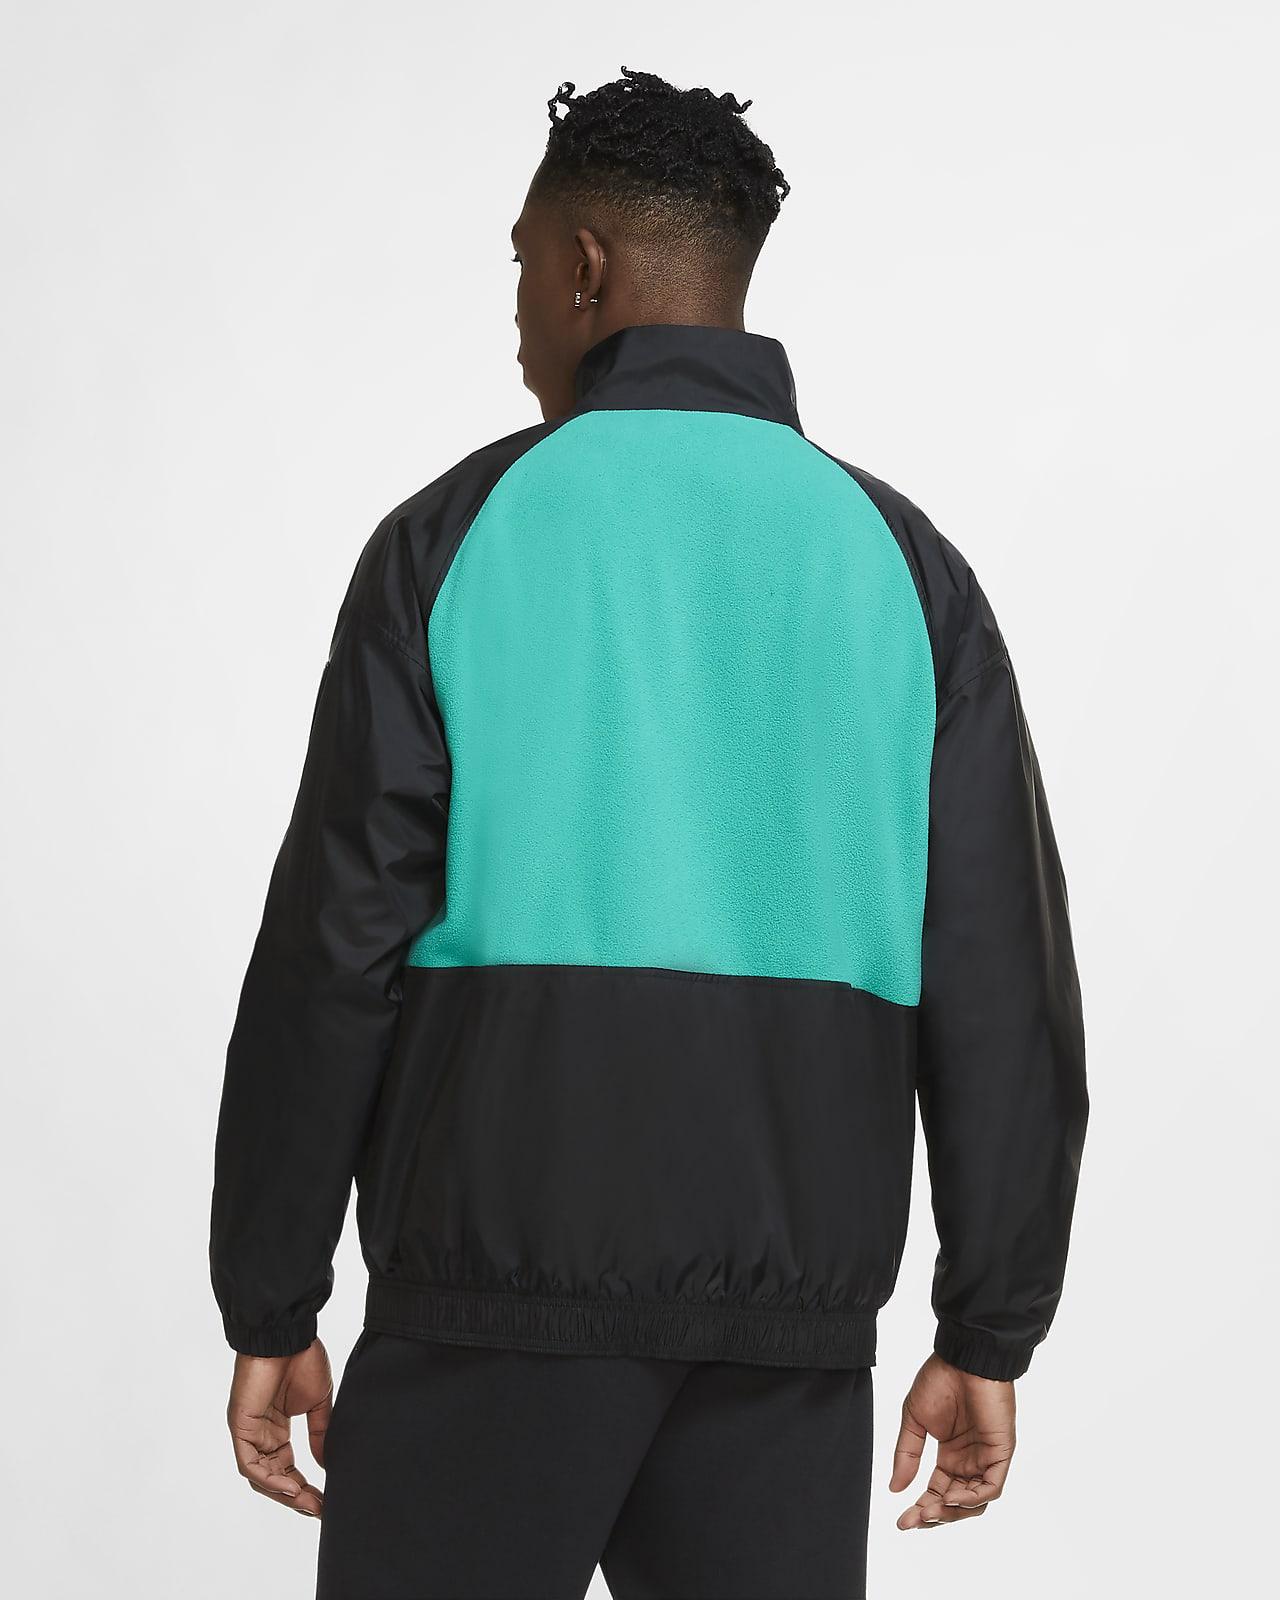 Jordan Winter Utility jakke til herre. Nike NO